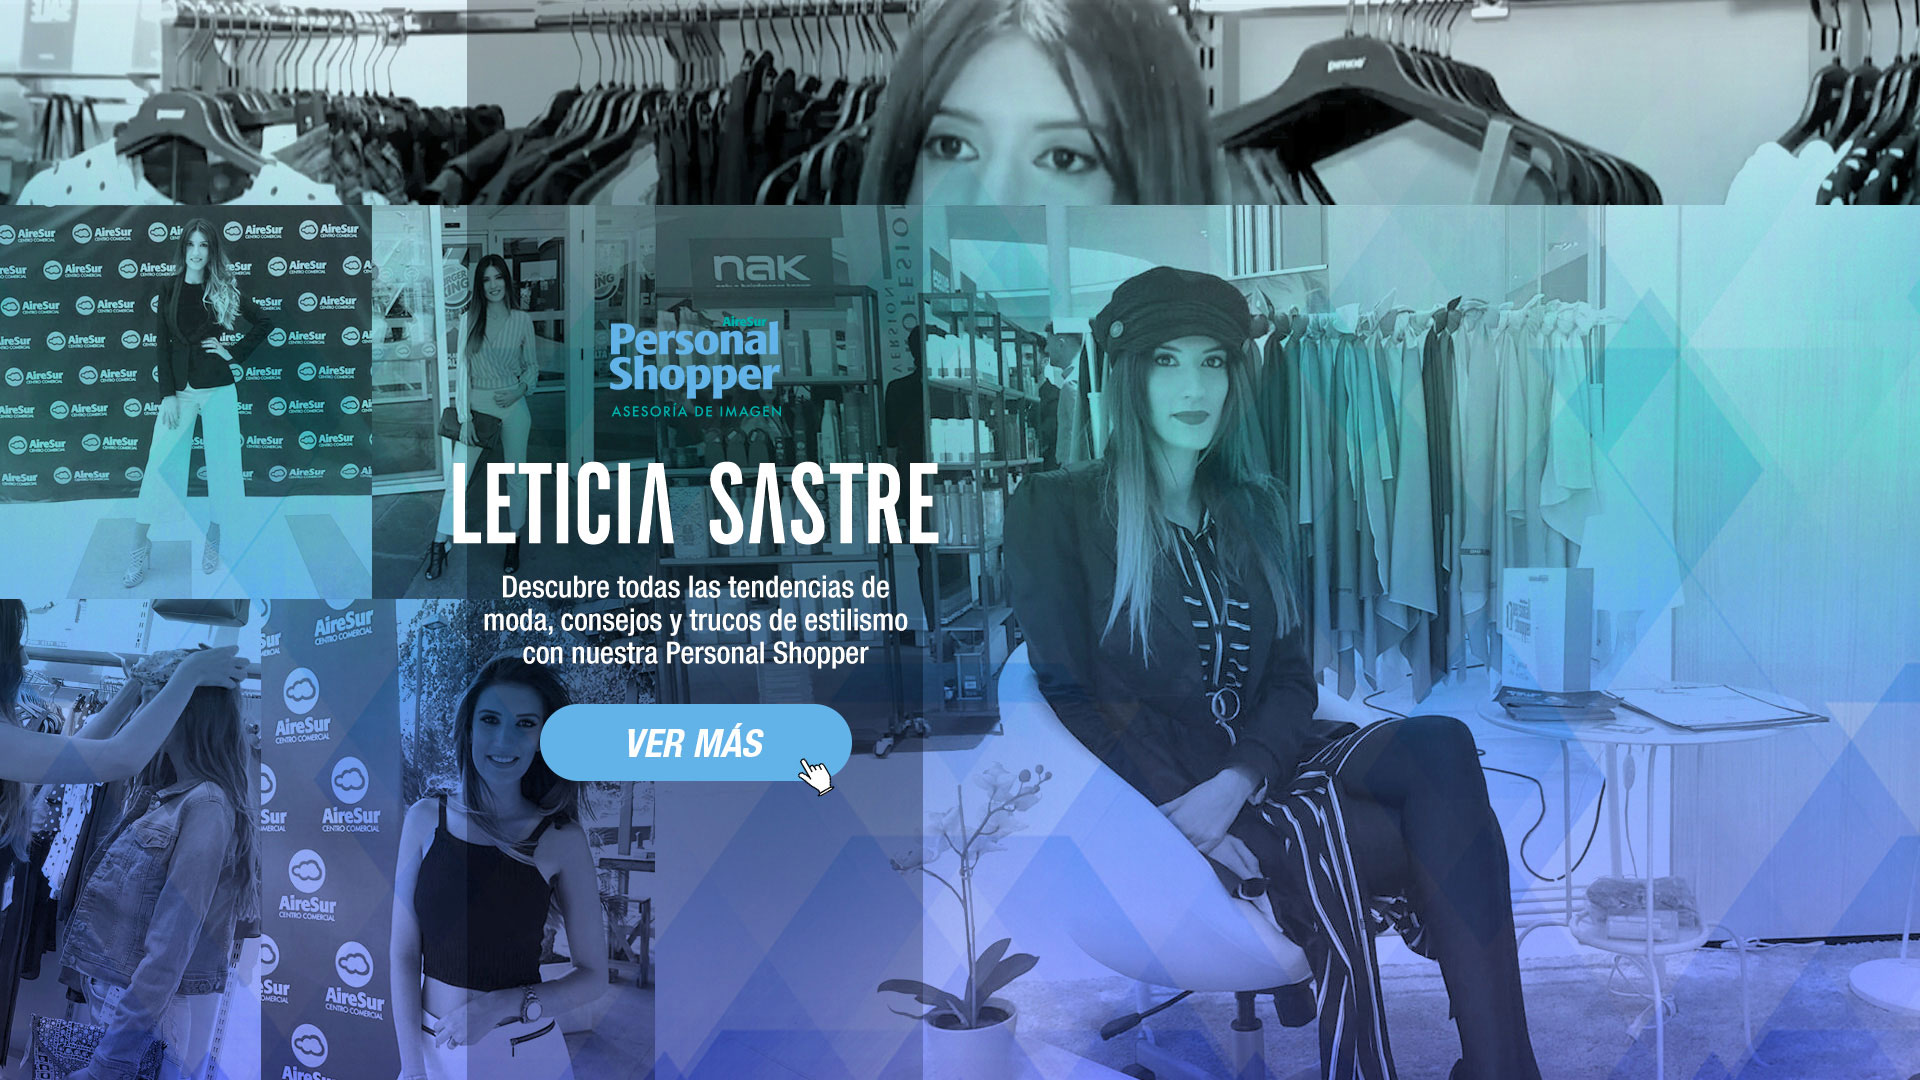 Personal Shopper AireSur Sevilla